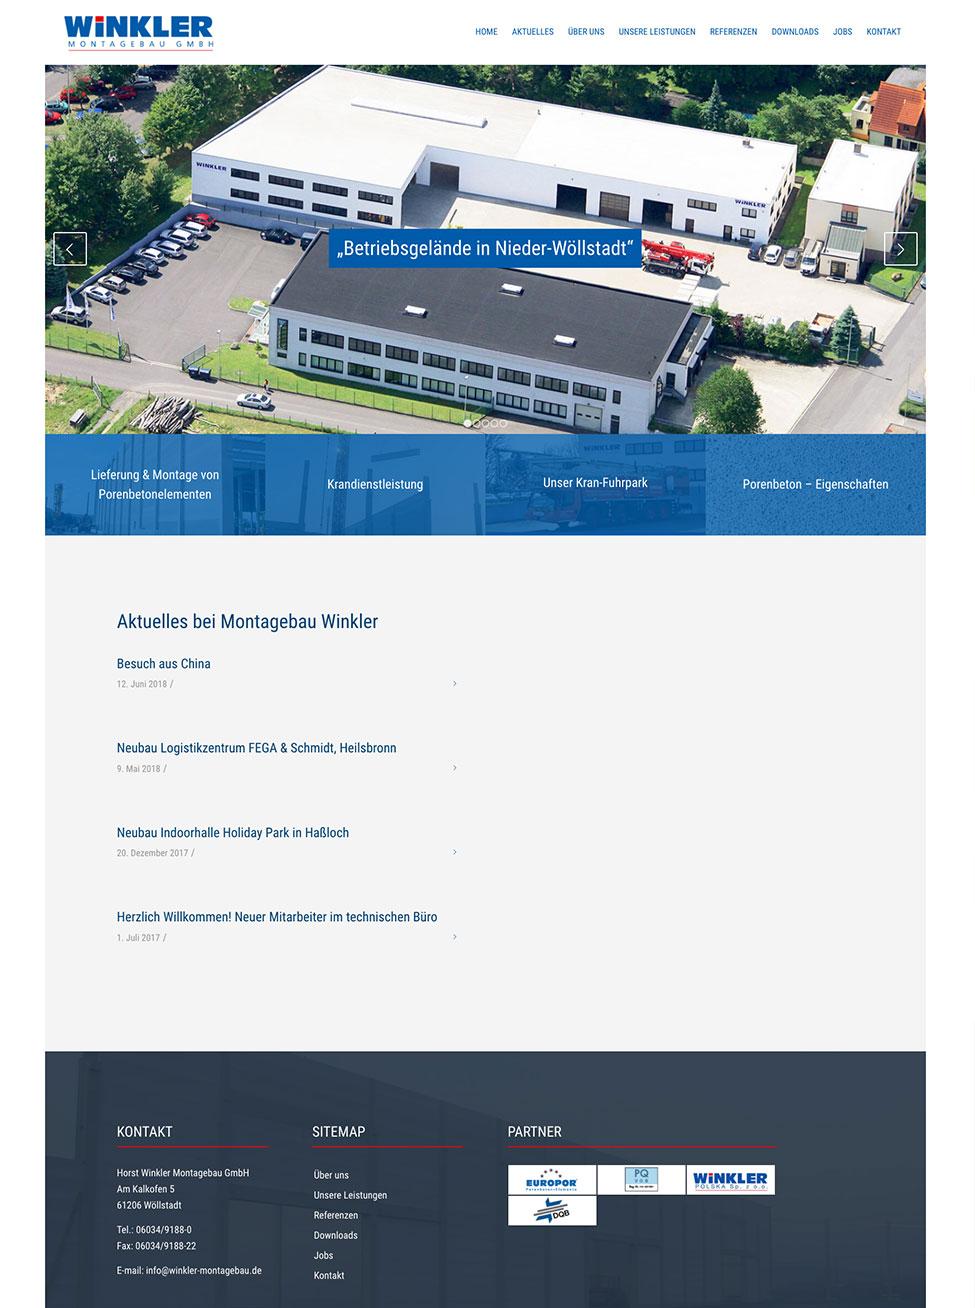 Horst Winkler Montagebau GmbH